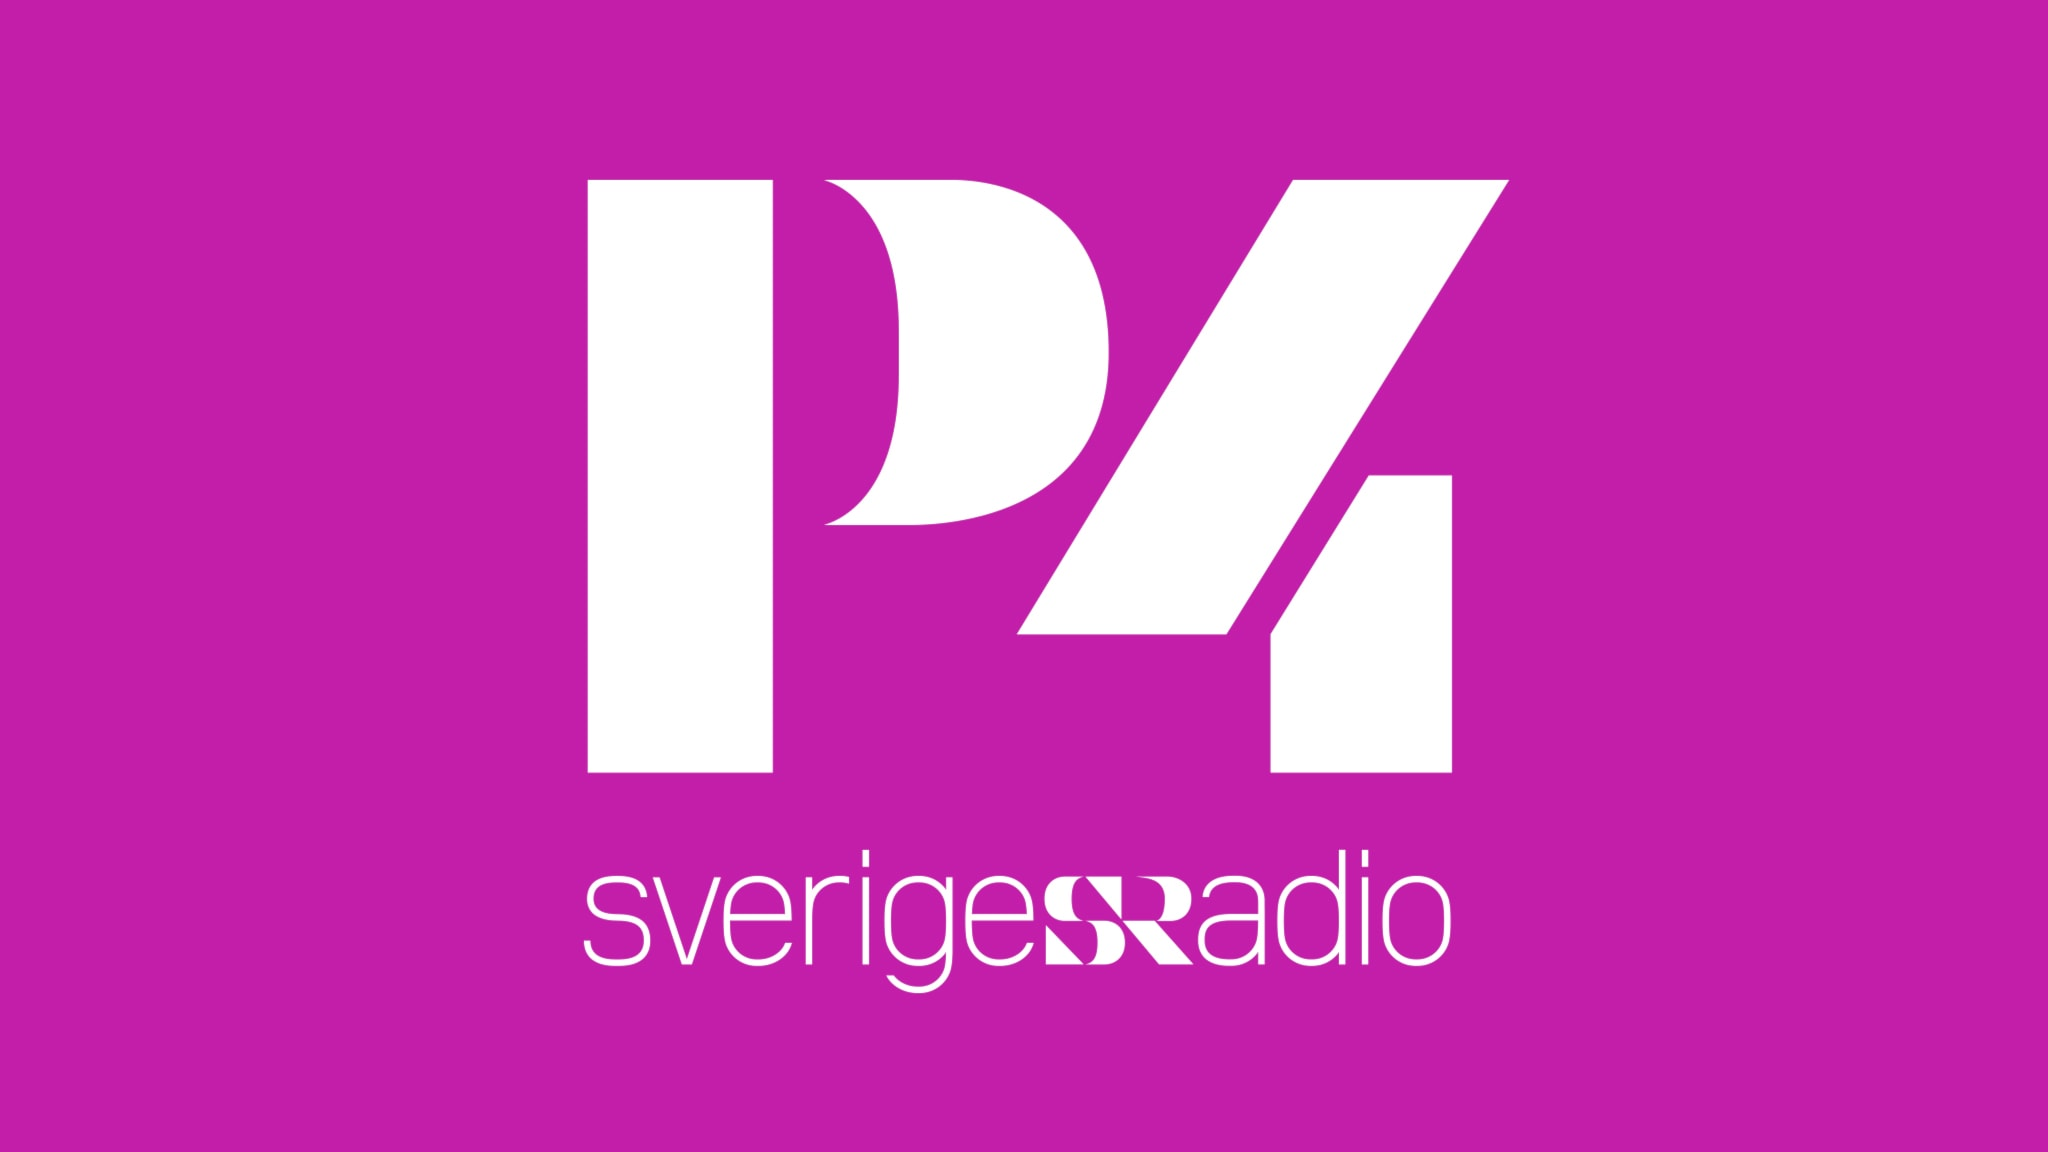 Trafik P4 Göteborg 20180515 18.01 (00.39) - spela